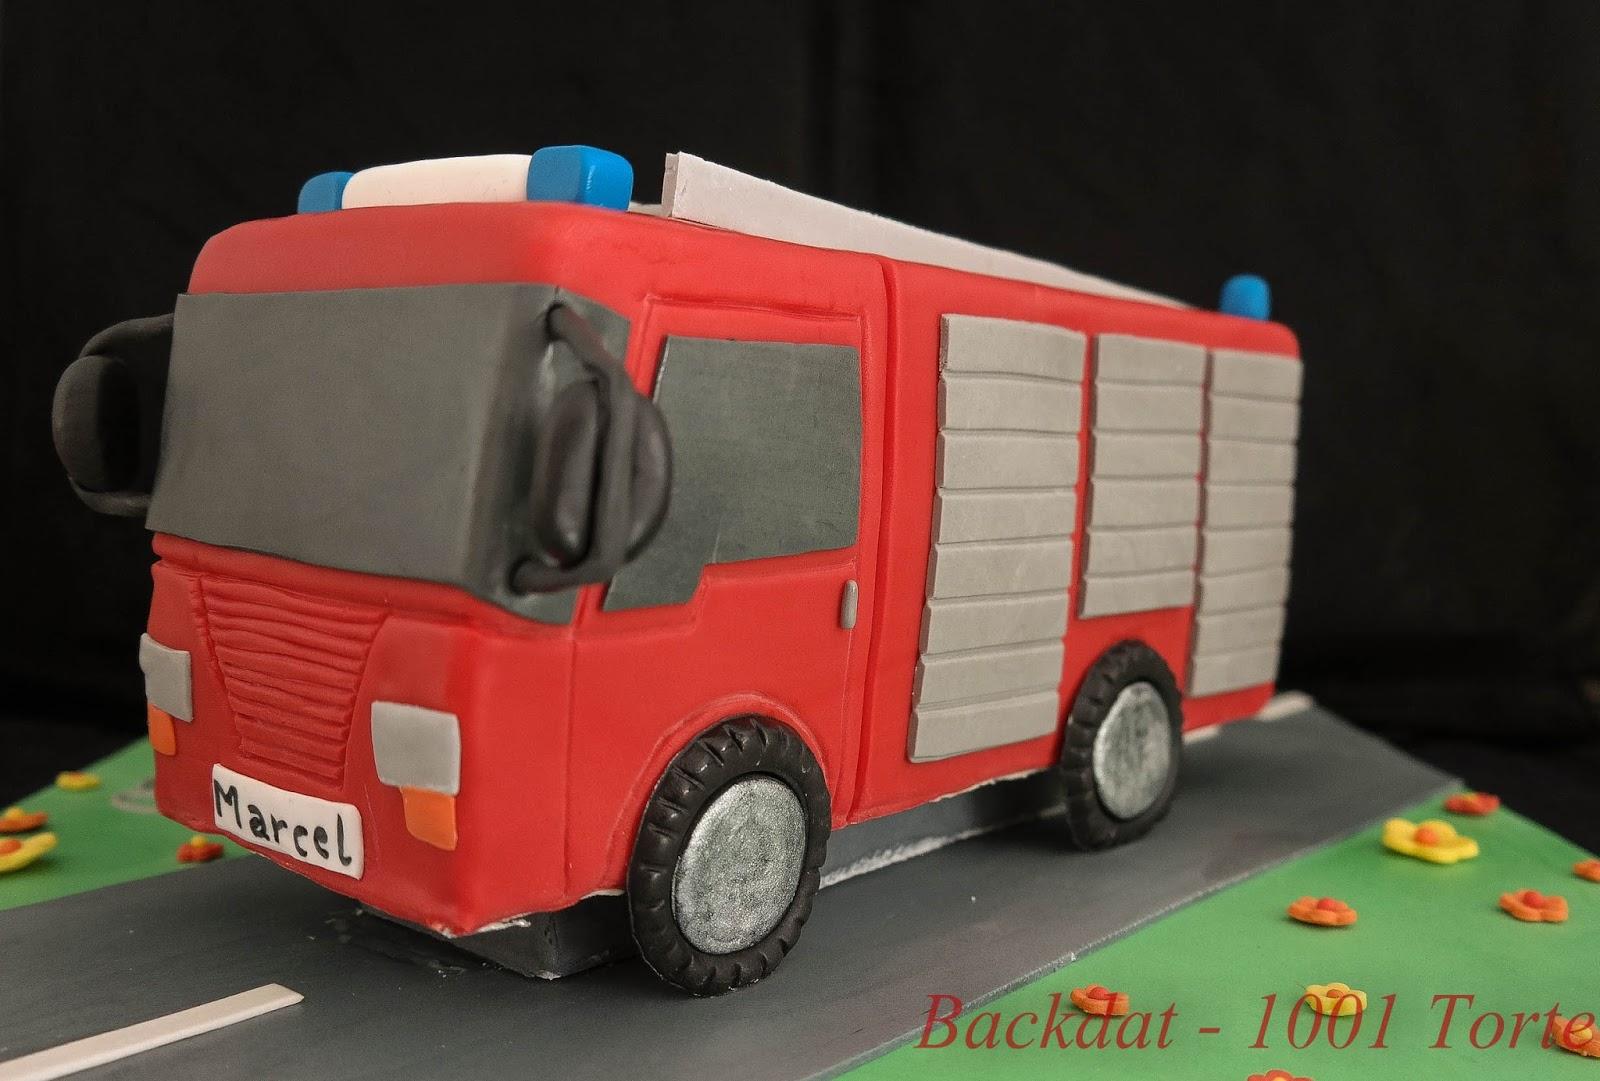 Backdat 1001 Torte Feuerwehrauto